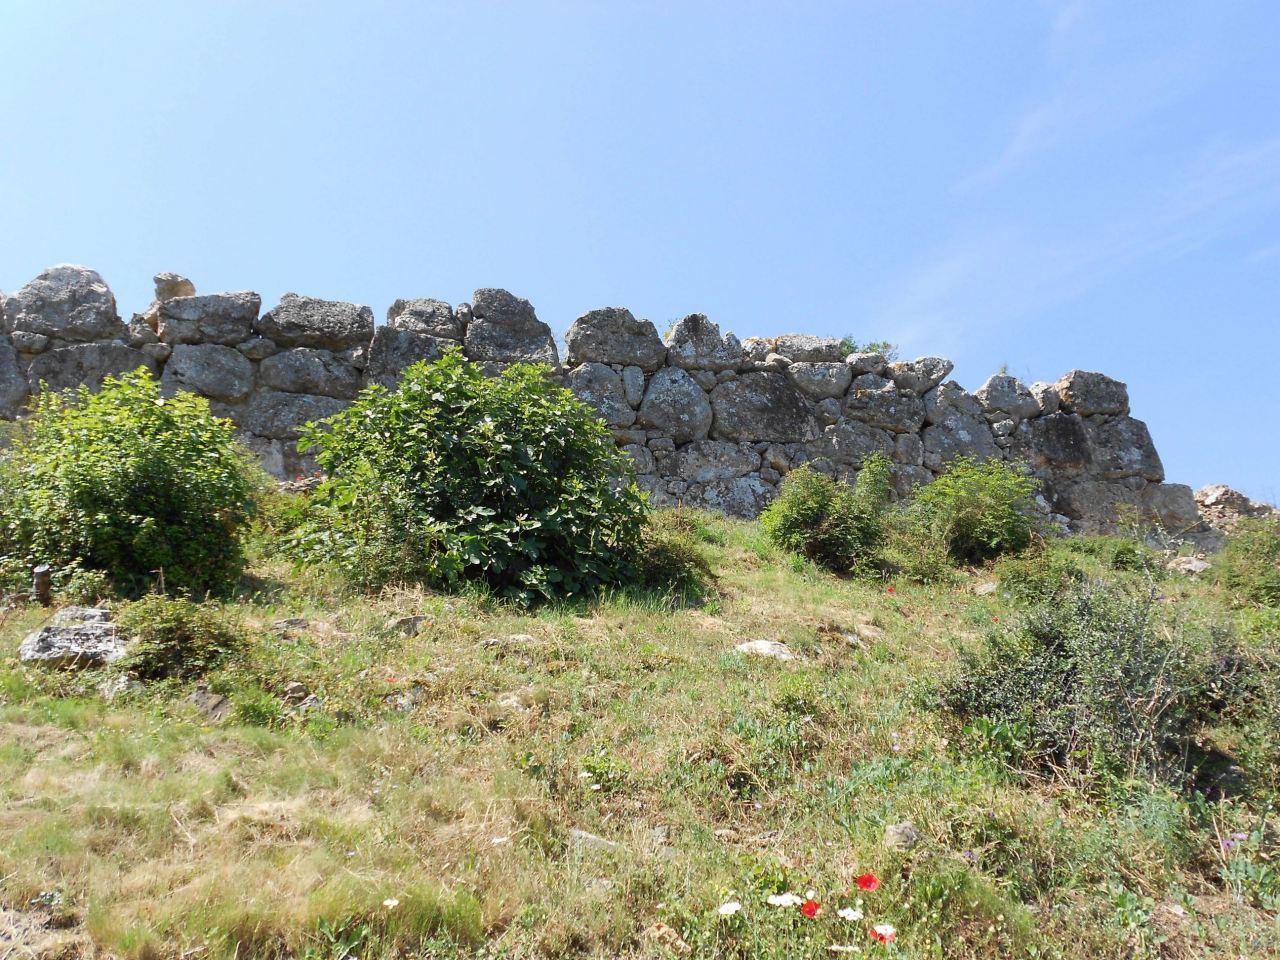 Roselle-Mura-Megalitiche-Roselle-Grosseto-Toscana-Italia-30